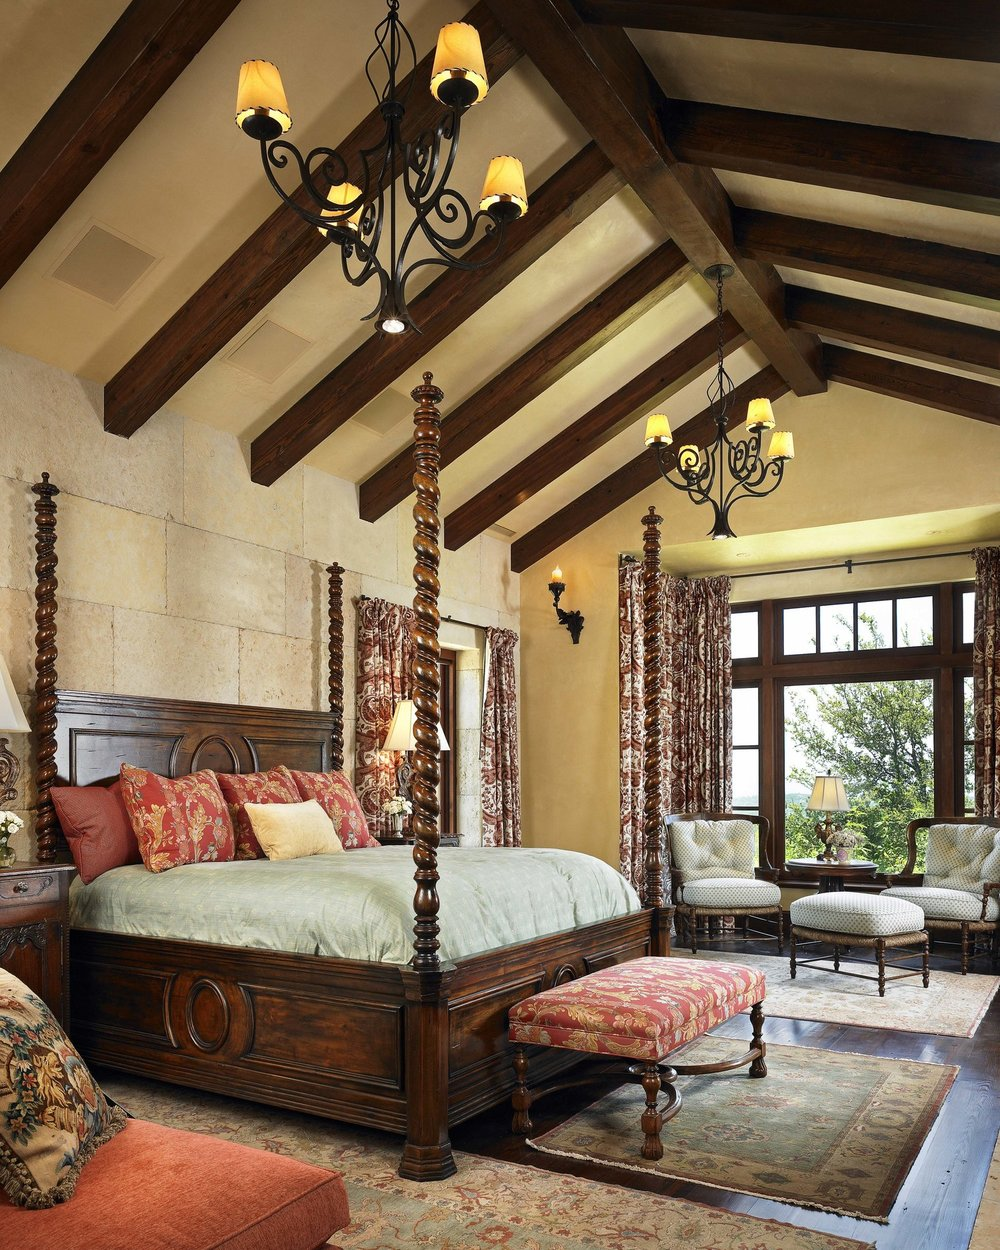 05.bedroom.jpg